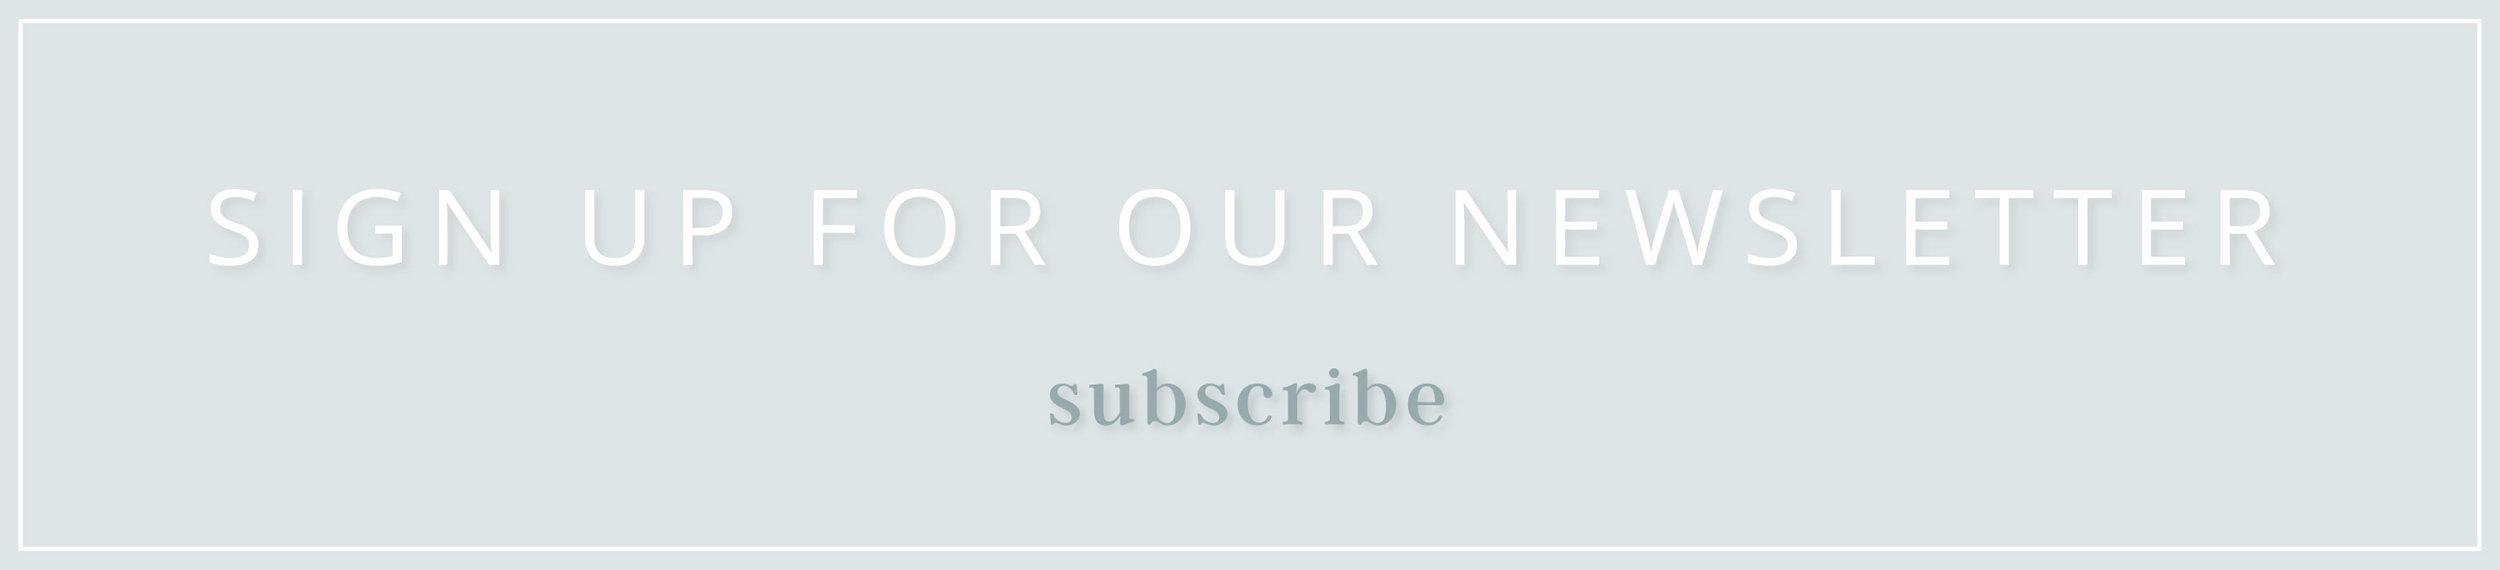 Newsletter+Signup+Block.jpg